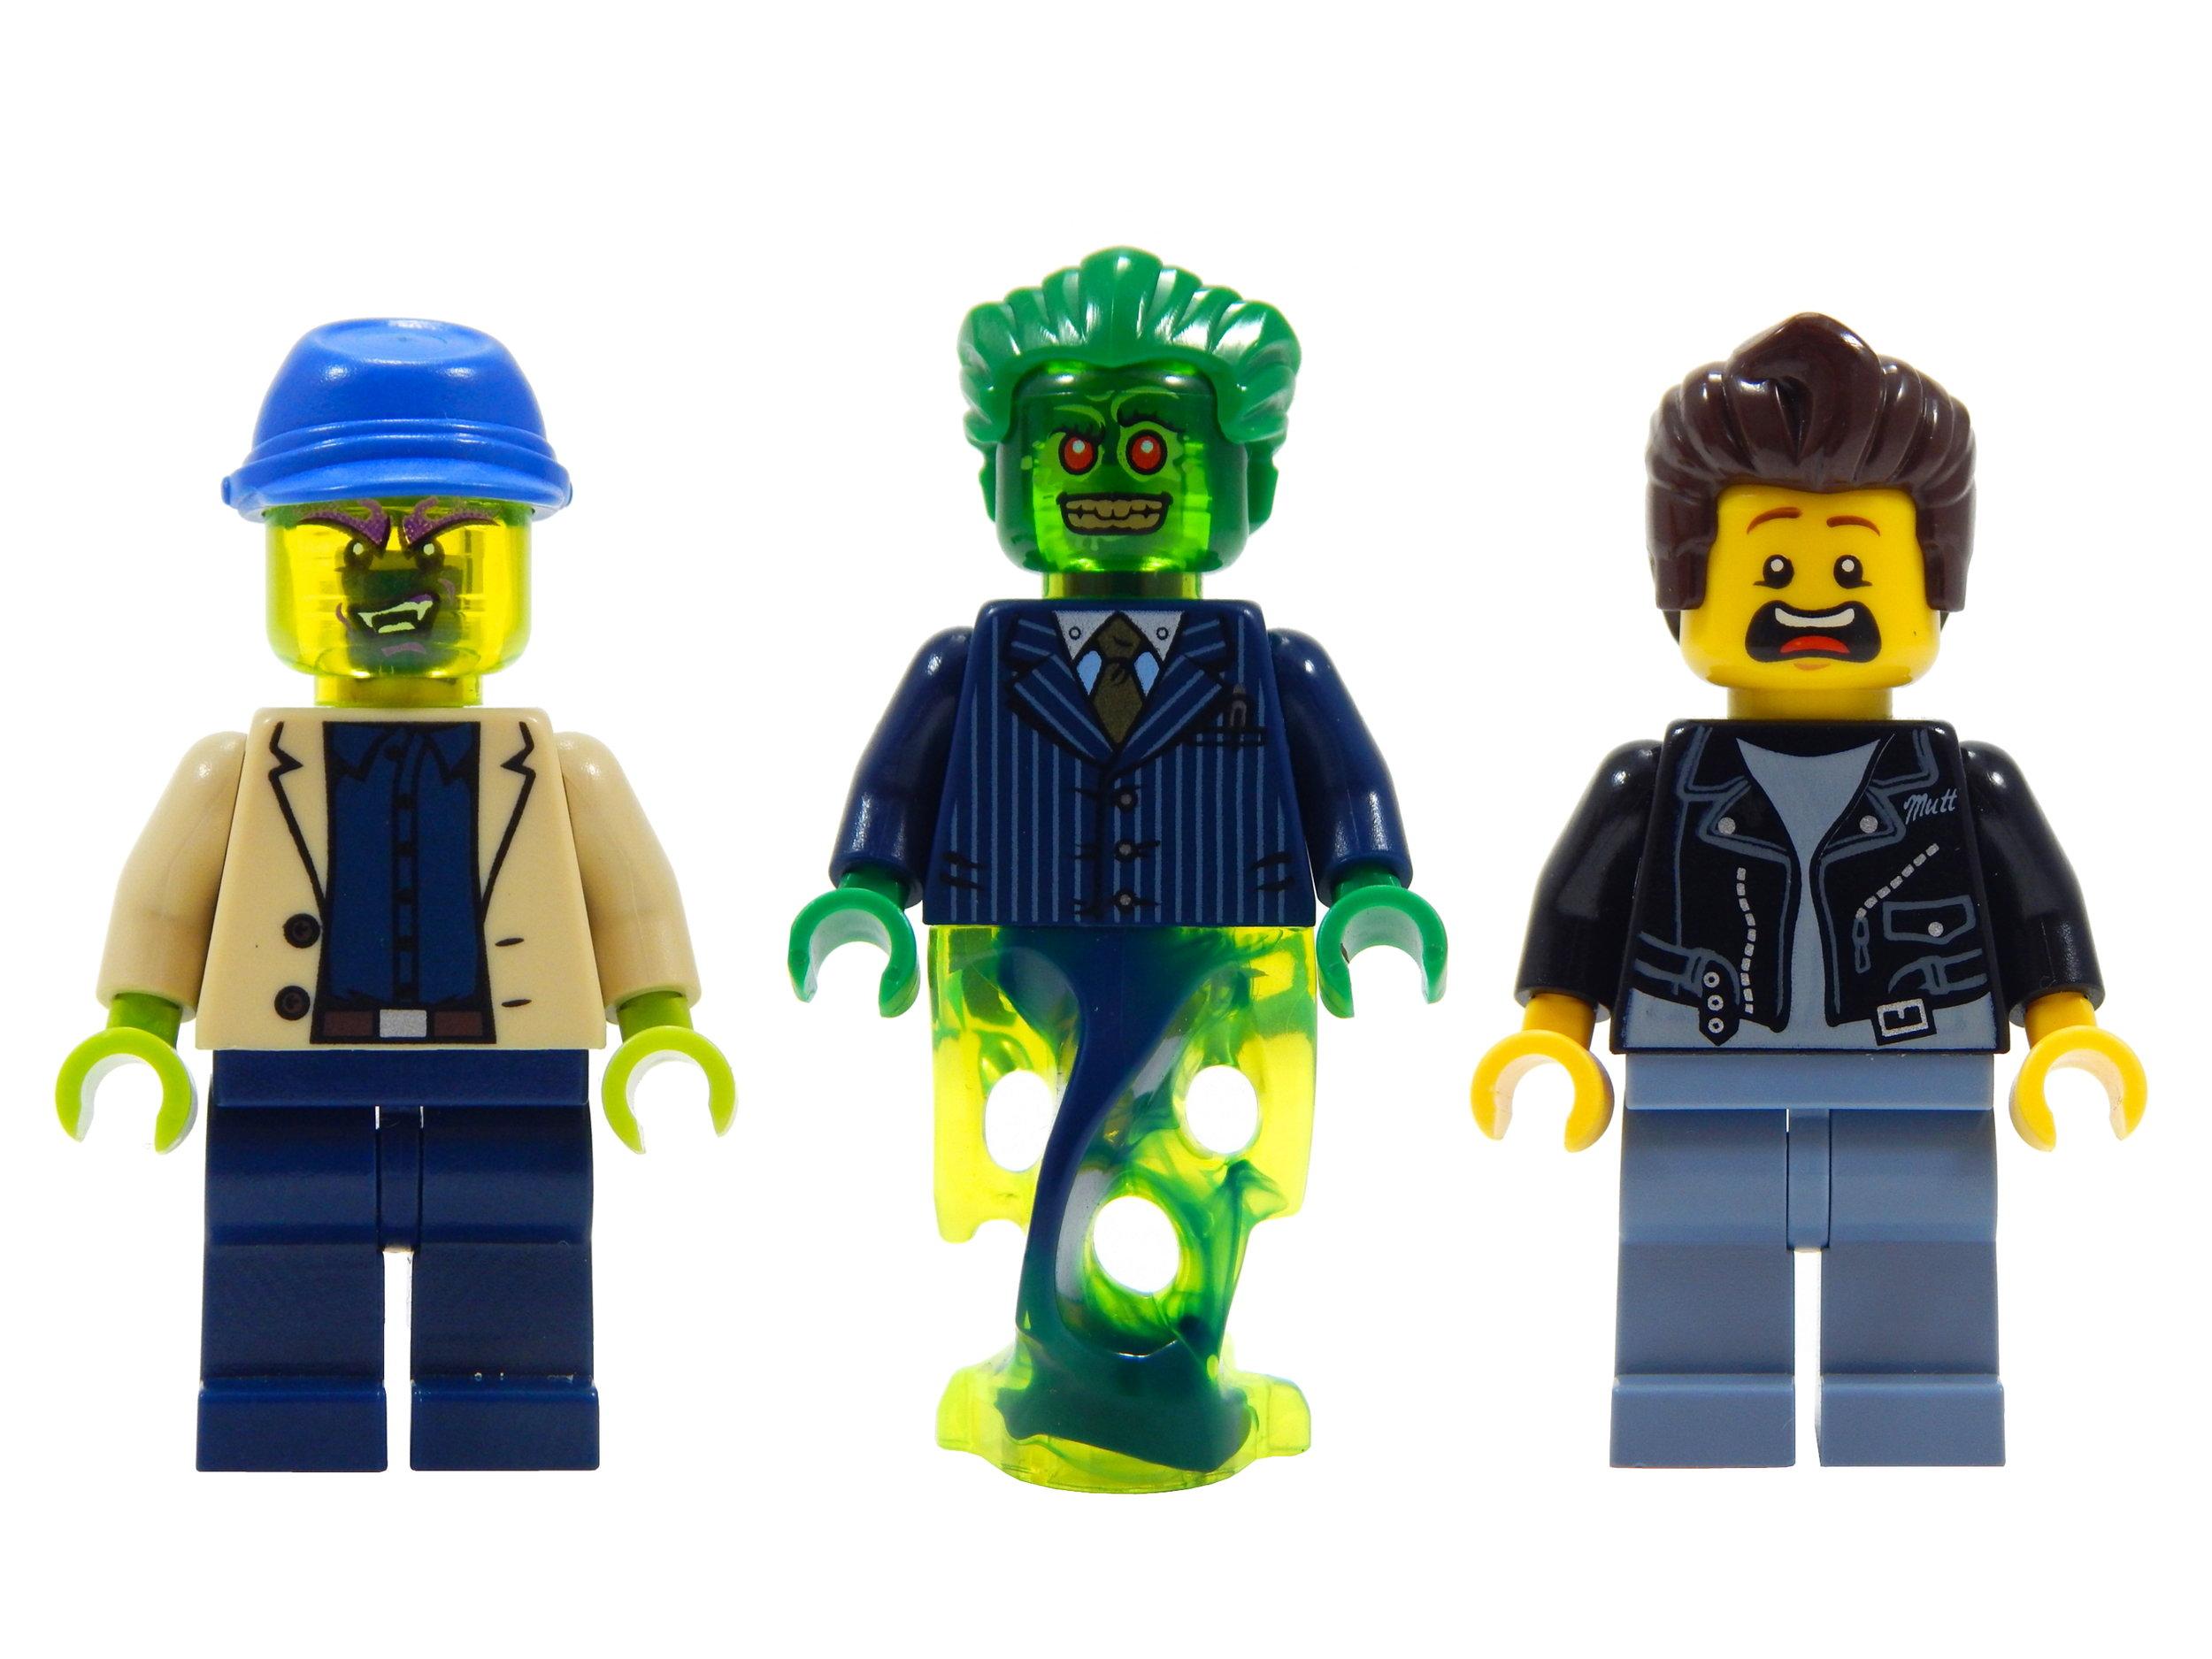 52013 Minifigures.jpg